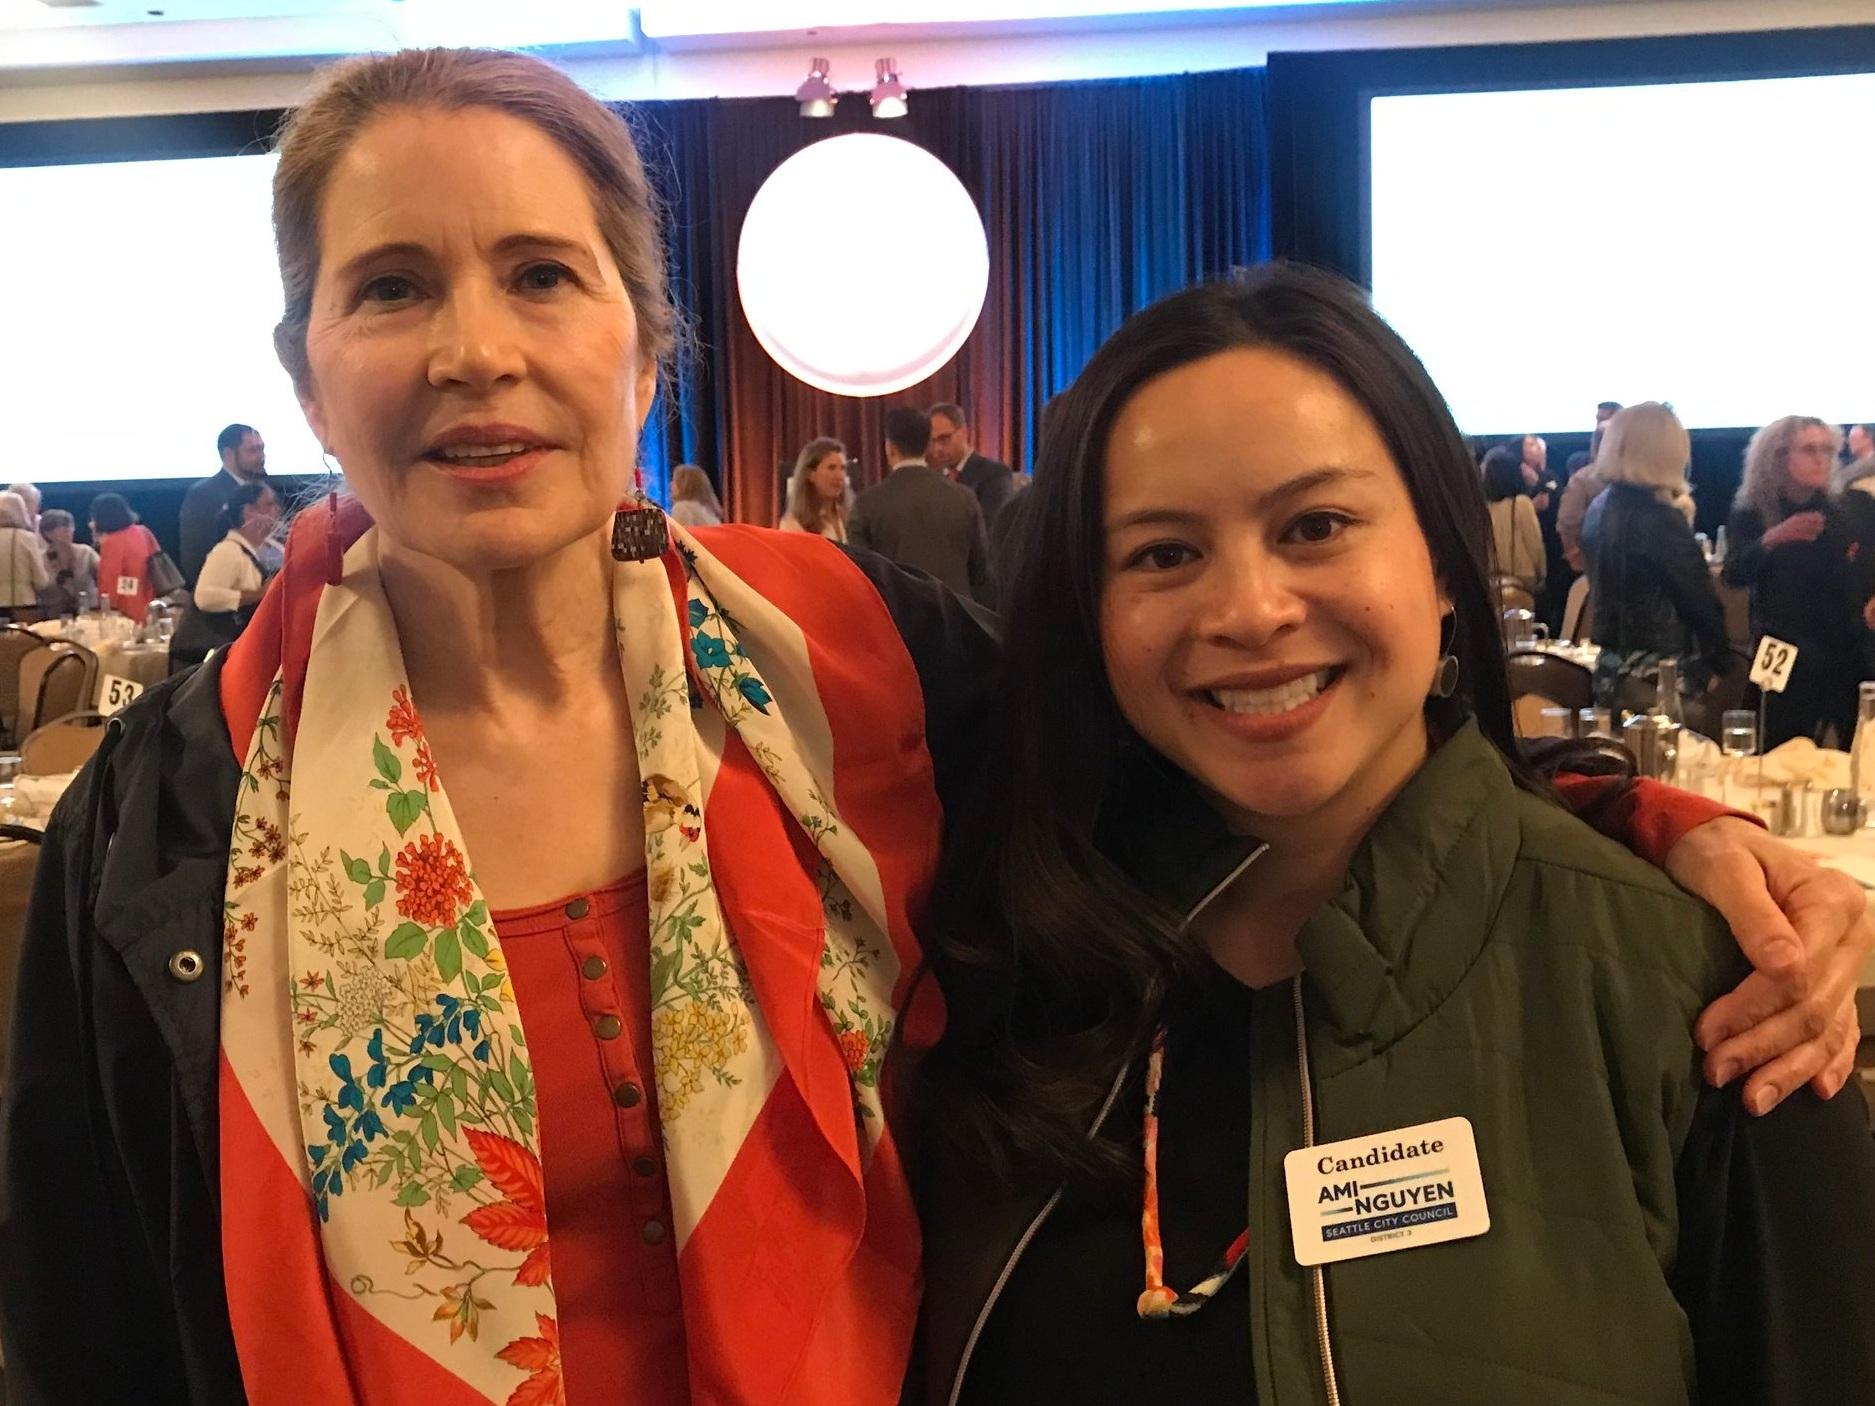 Cheryl Berenson  - Board of Directors, Secretary, Alliance for Gun Responsibility • Foundation Board Member, Washington State Policy Advocate (SPA) • National Council of Jewish Women.